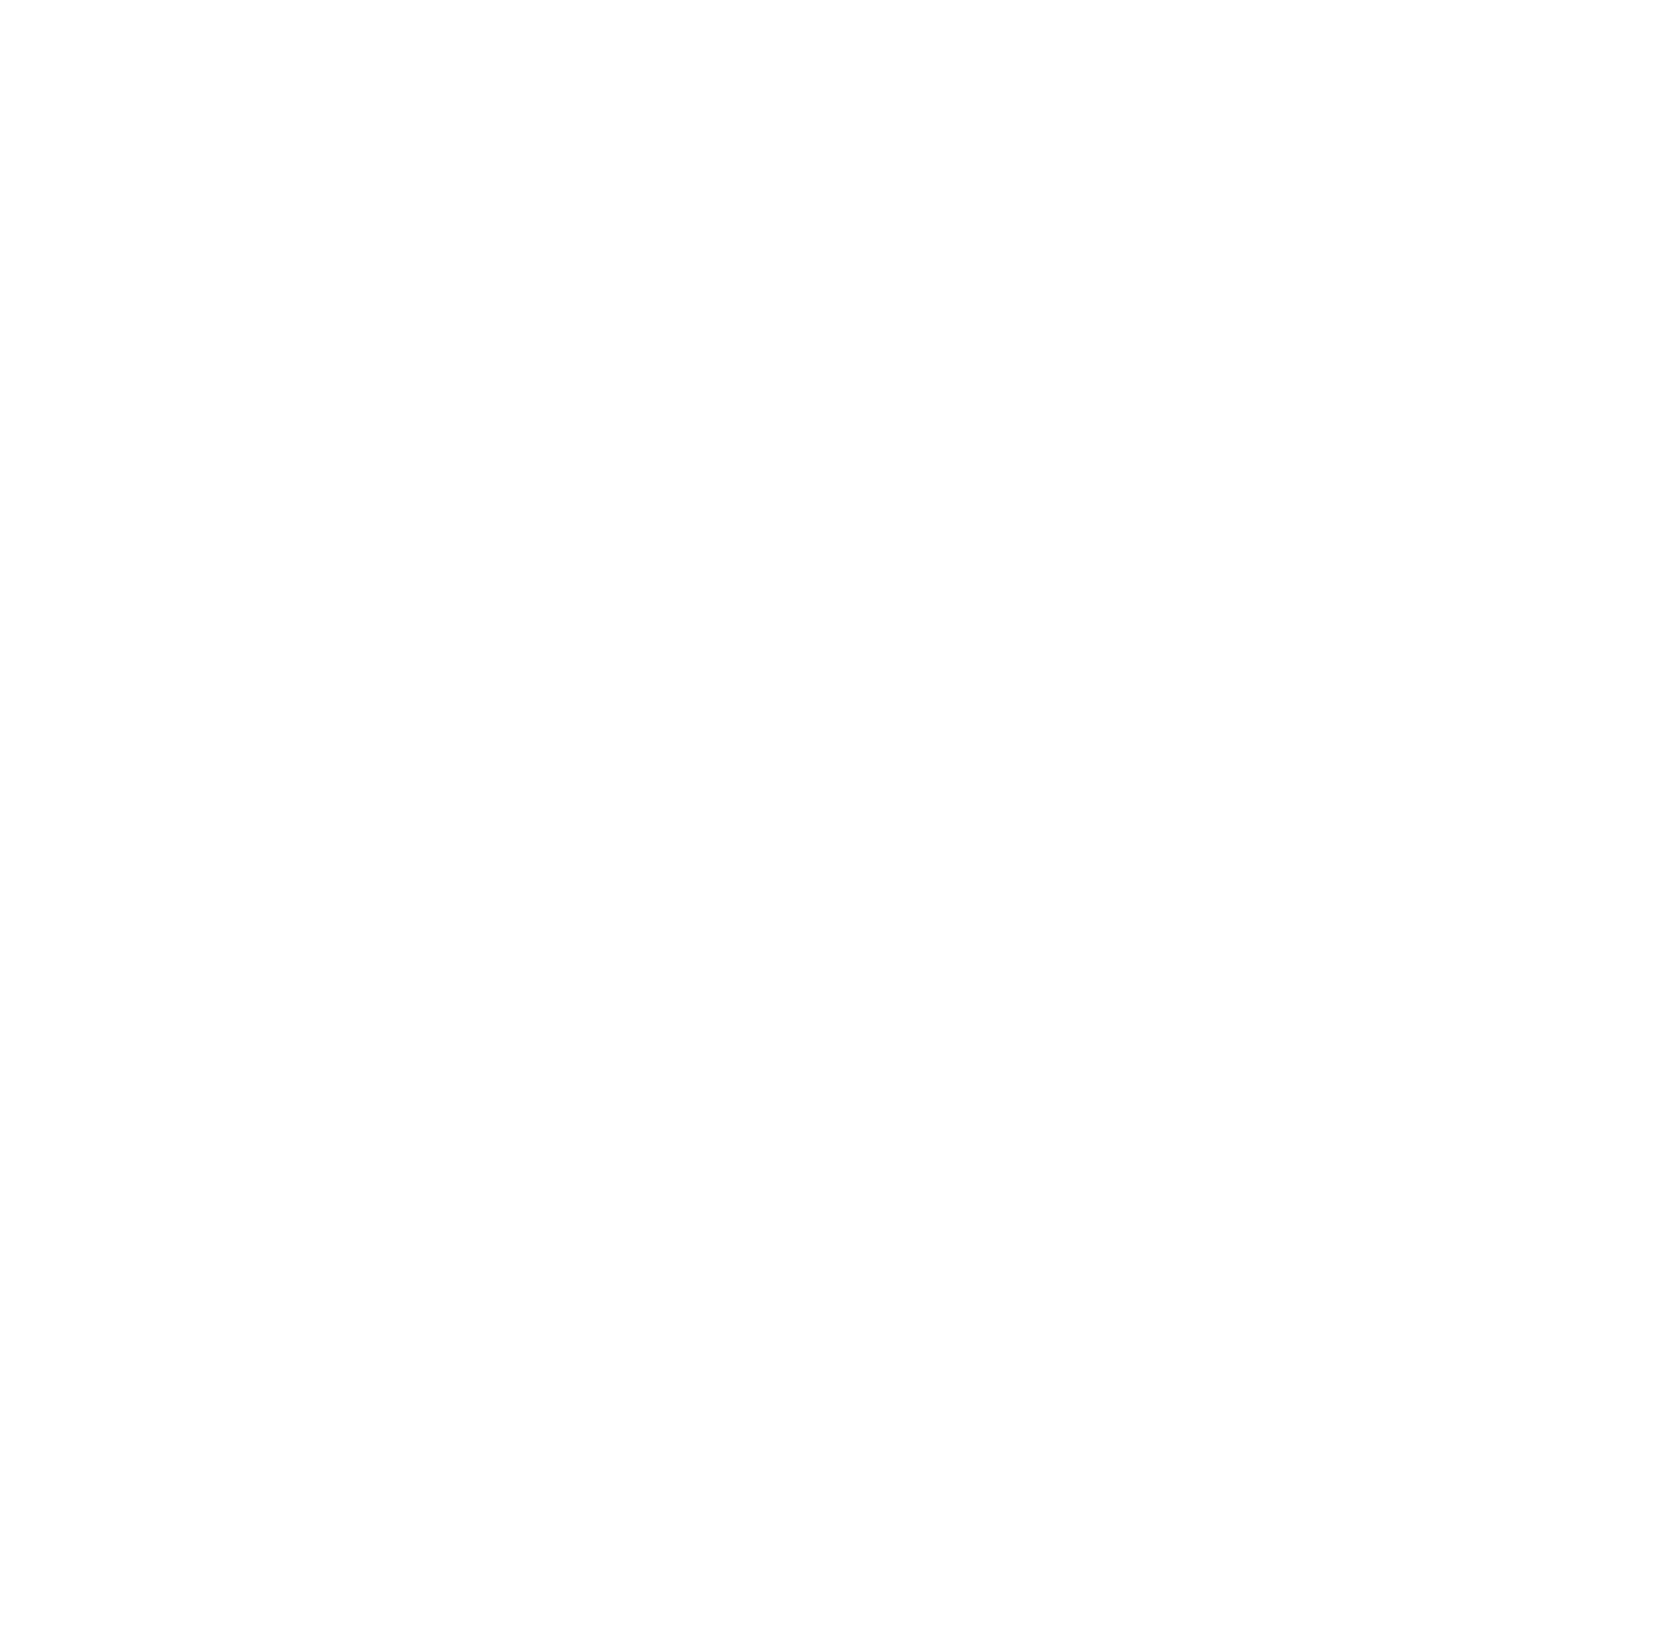 Miracle House Terminator 2 T-800 Endoskeleton 1:6 Scale Figure